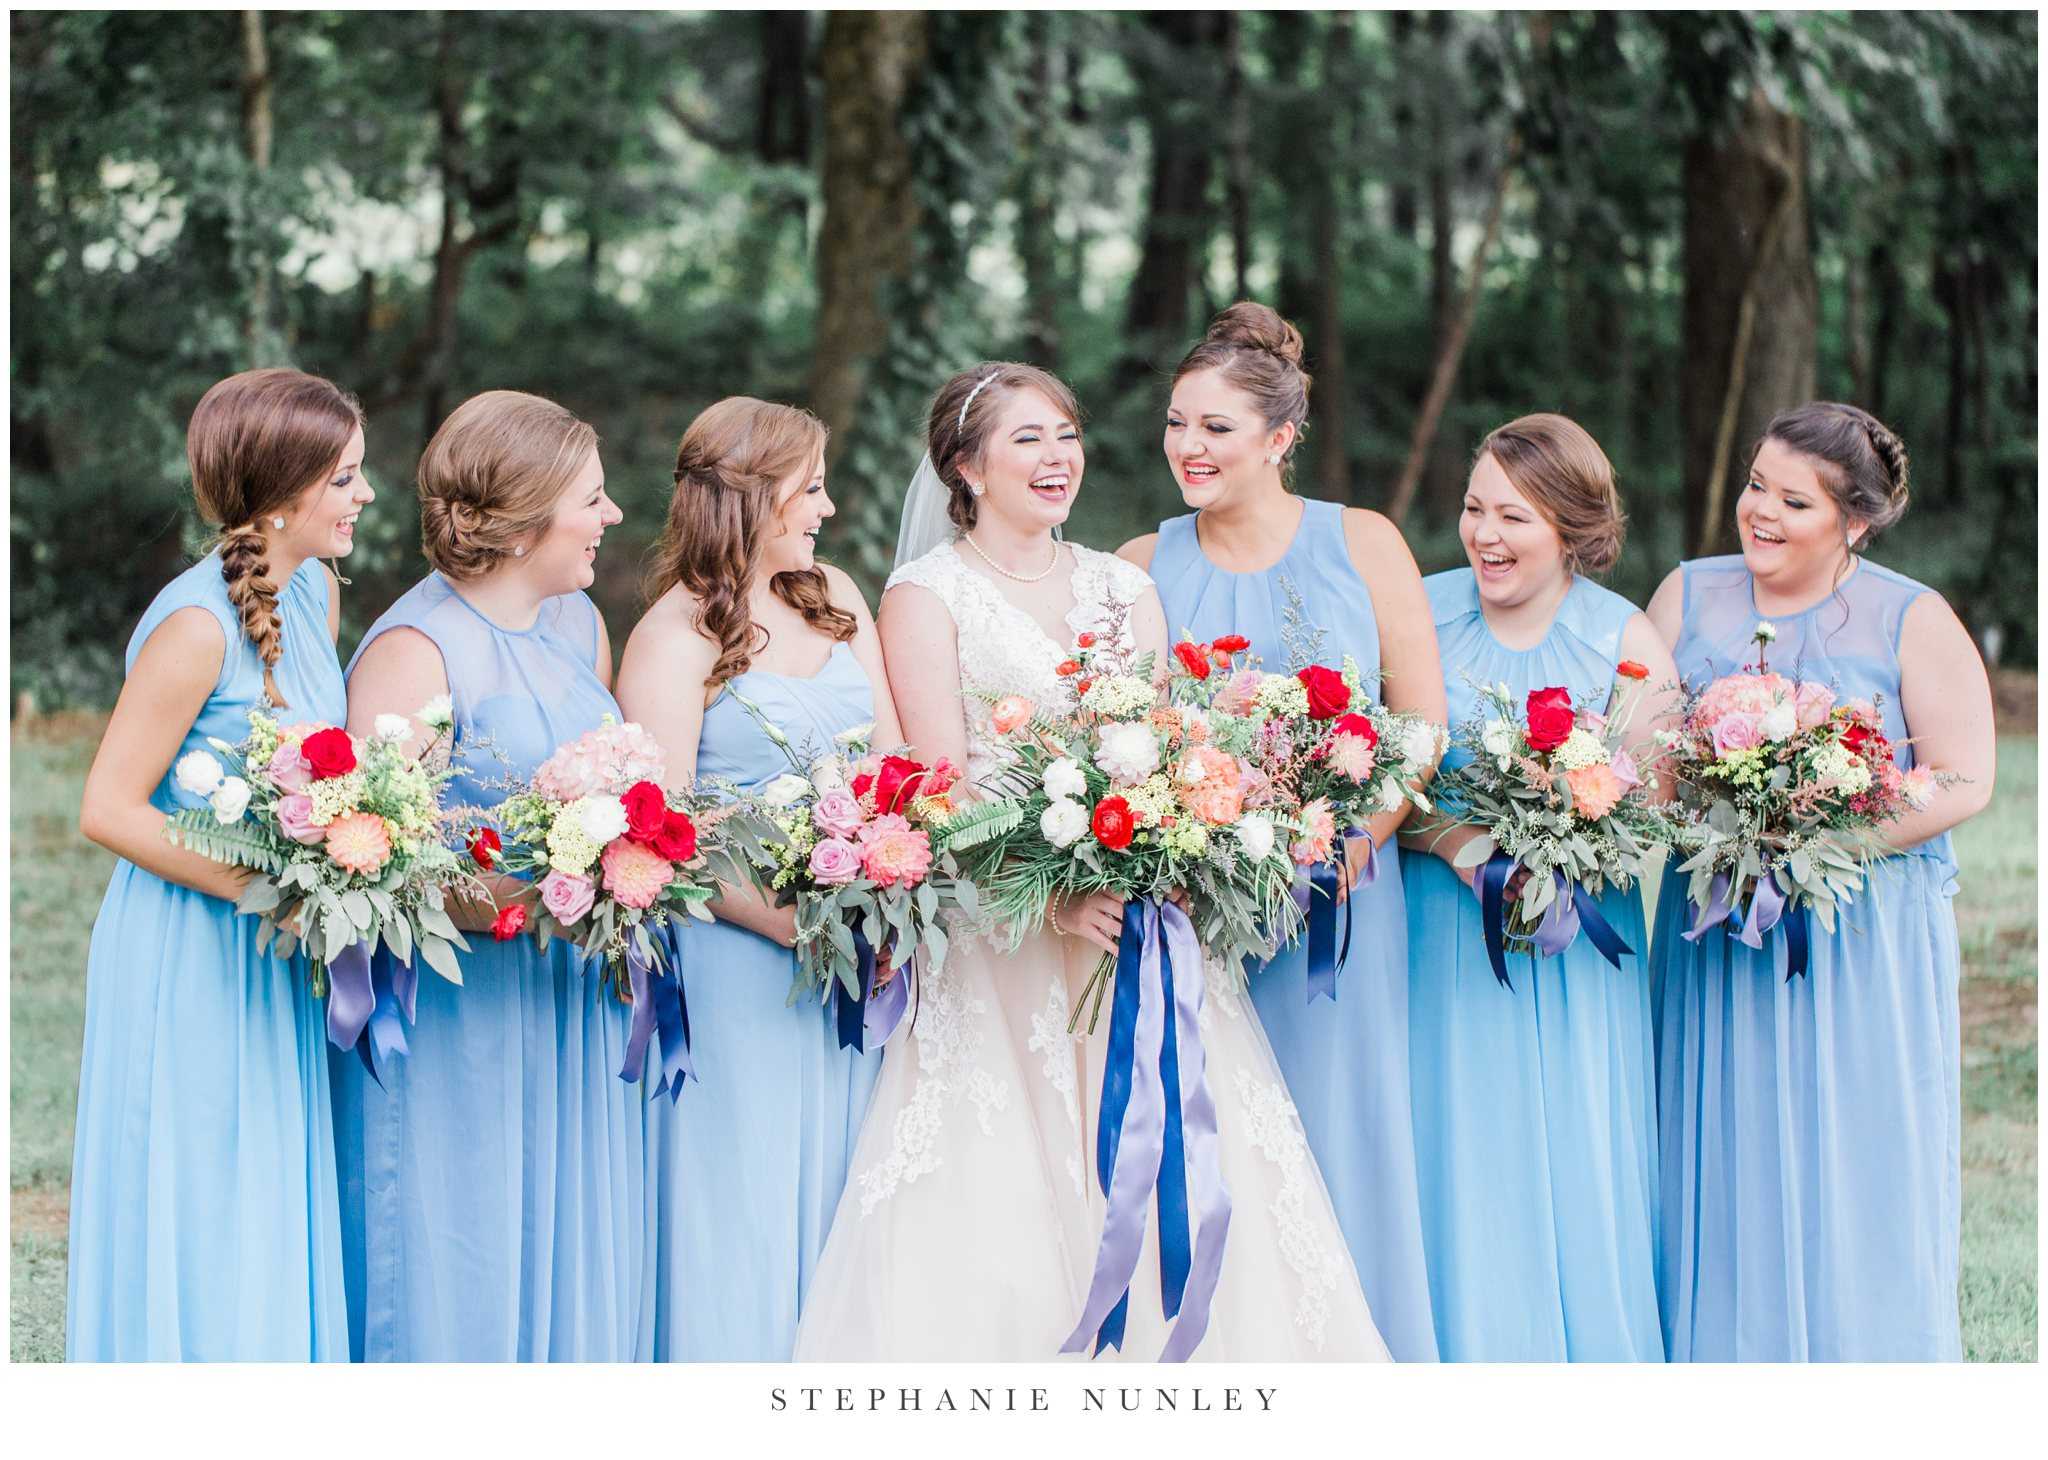 arkansas-wedding-with-lush-wildflower-bouquet-0068.jpg